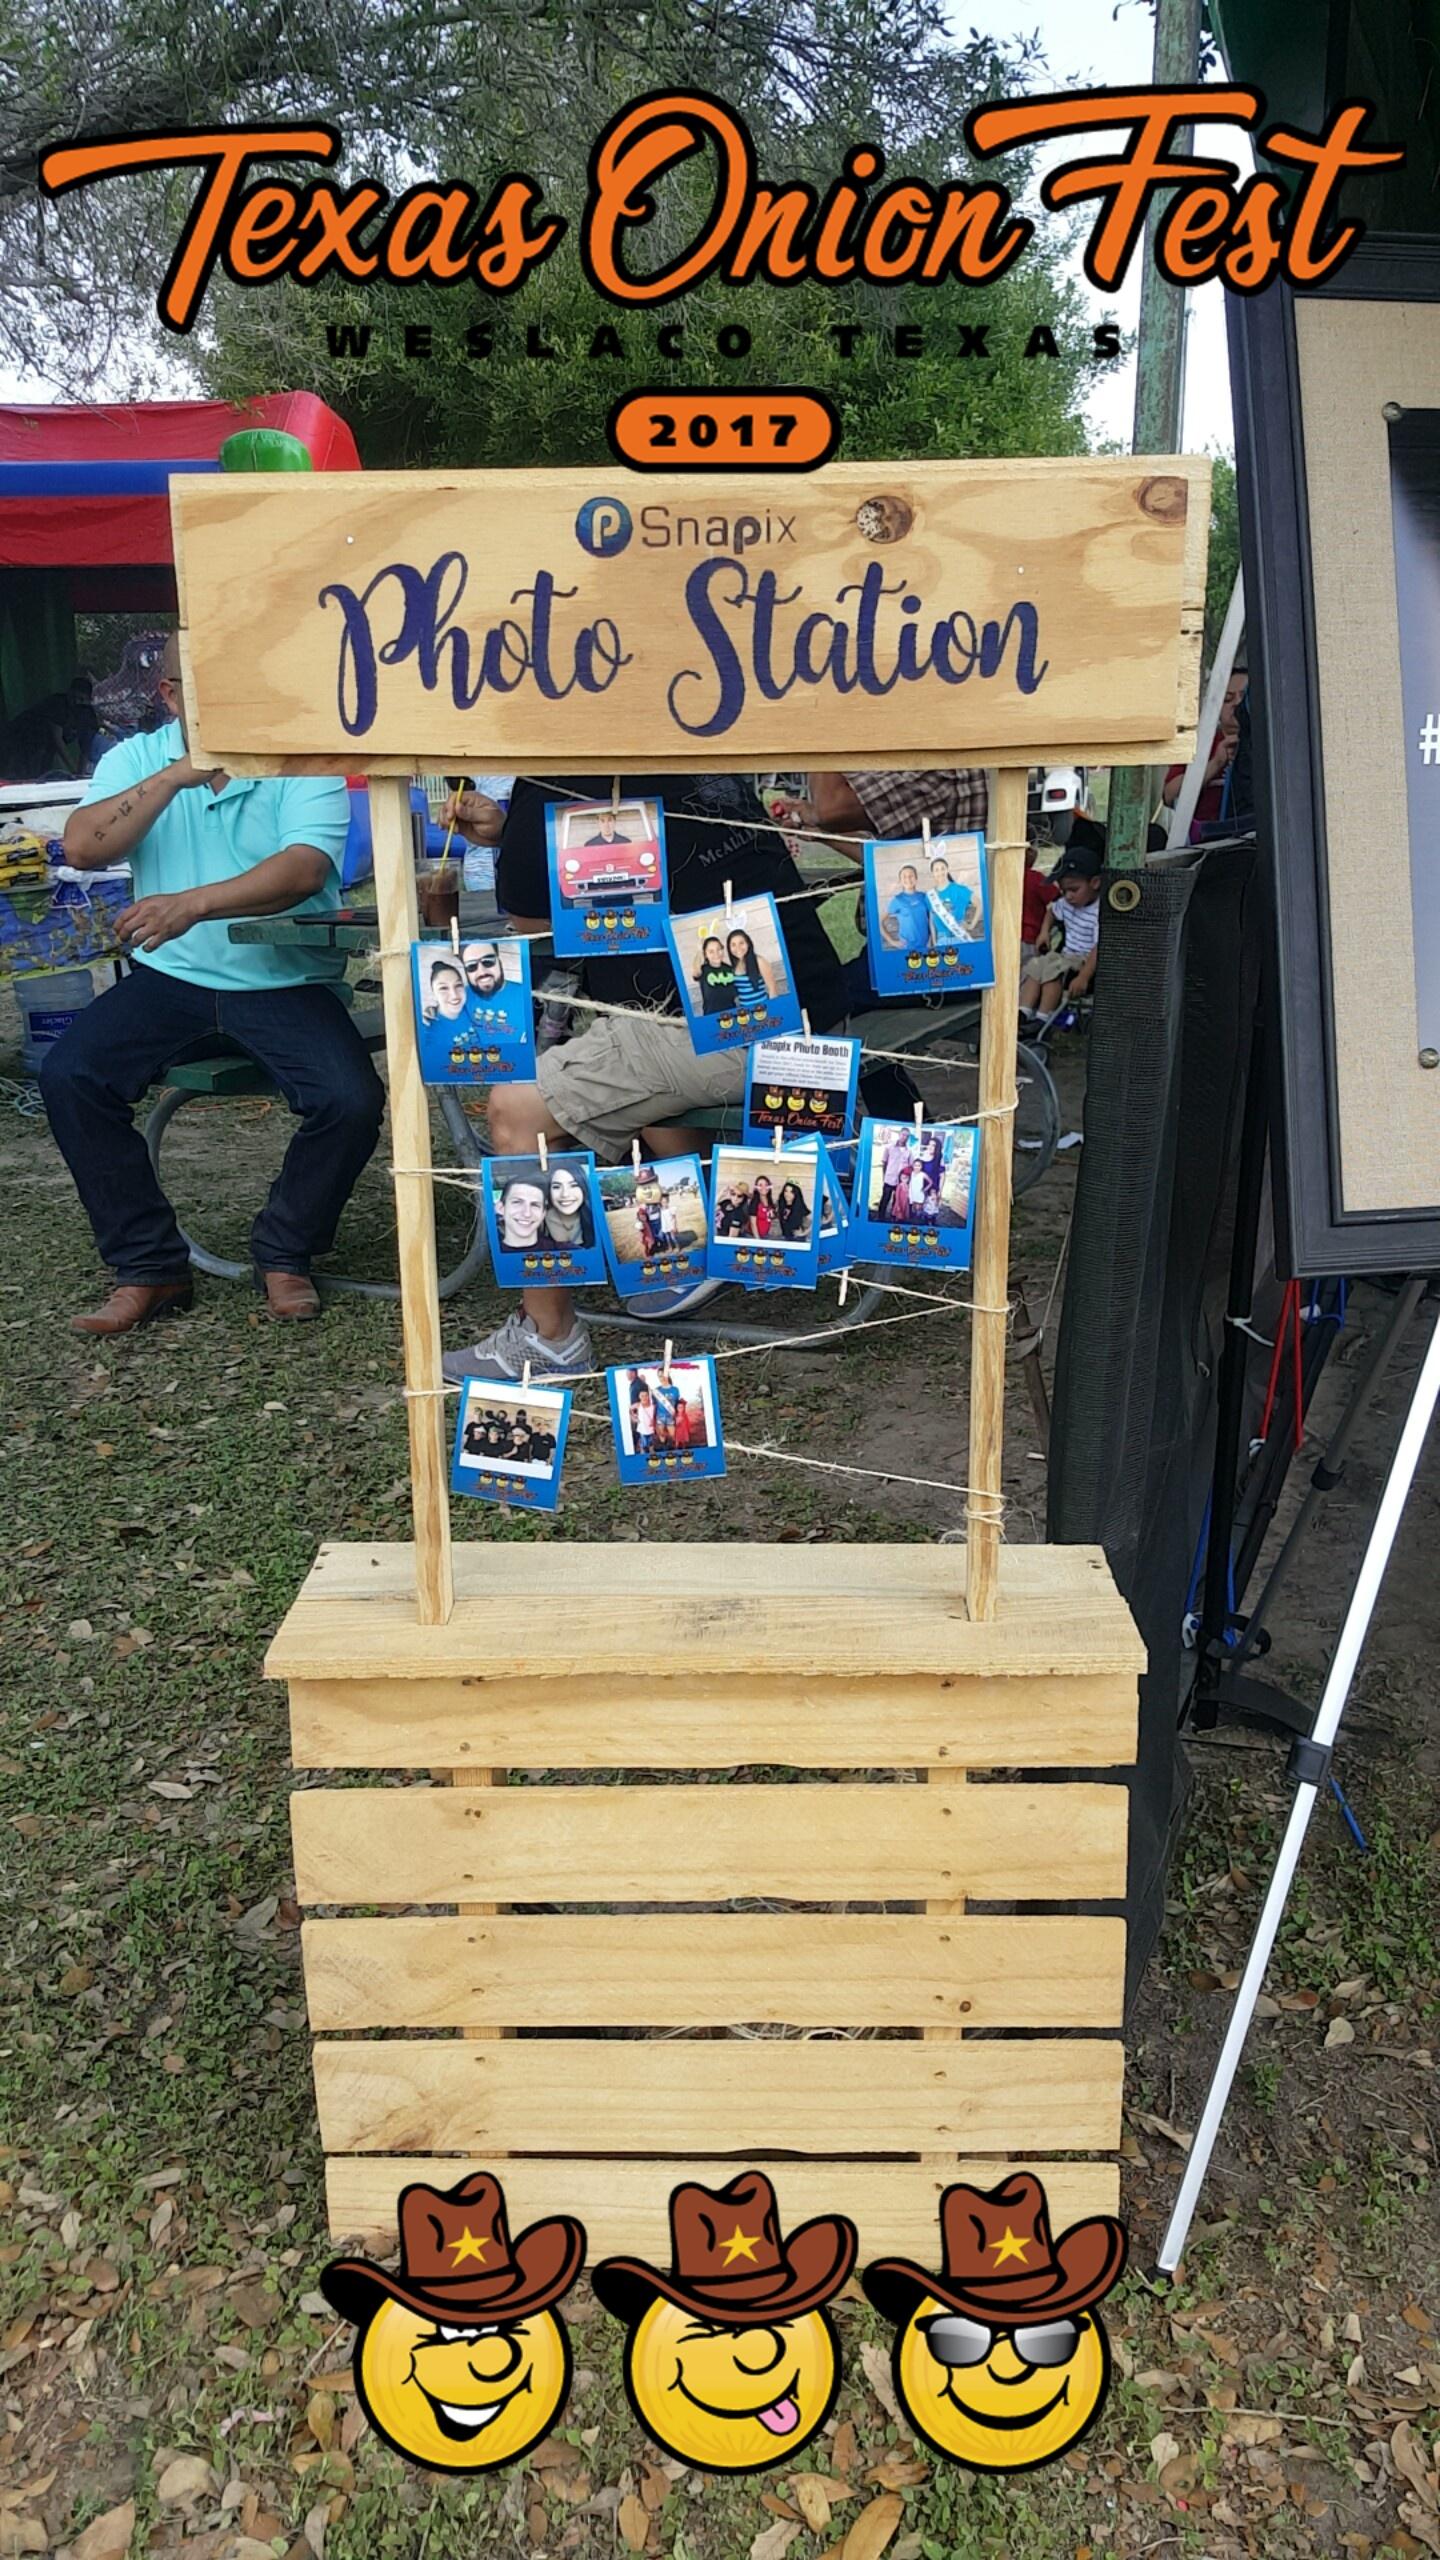 Texas Onion Fest Snapchat Filter